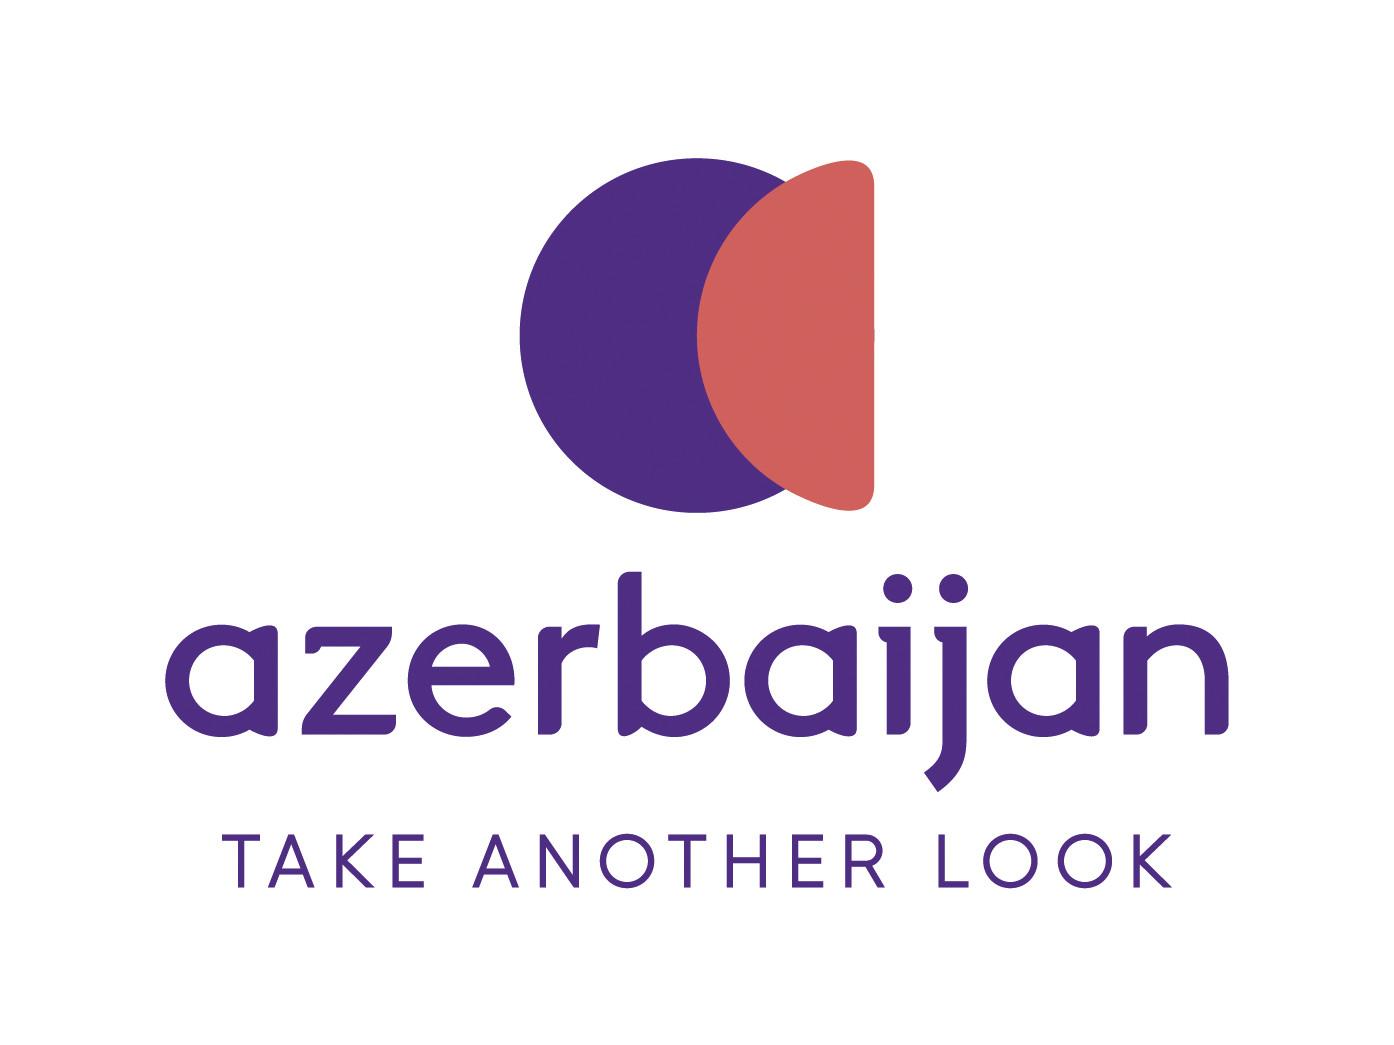 Azerbaijan.travel